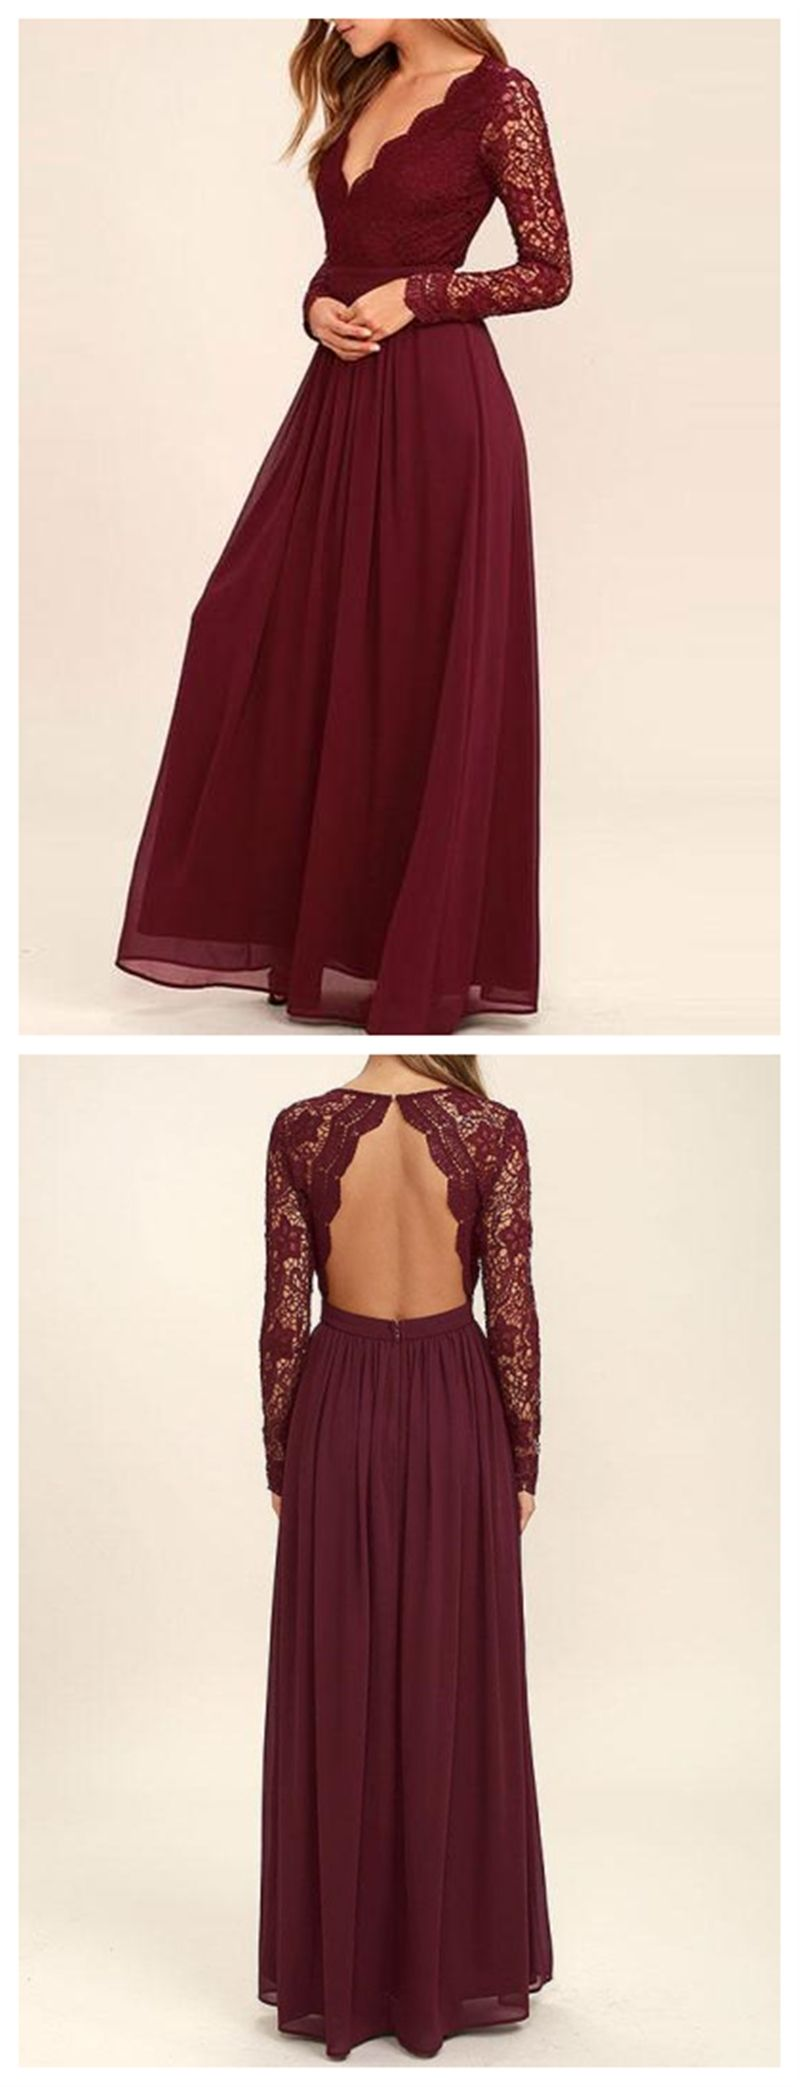 Dark red long sleeve lace long bridesmaid dresses cheap chiffon